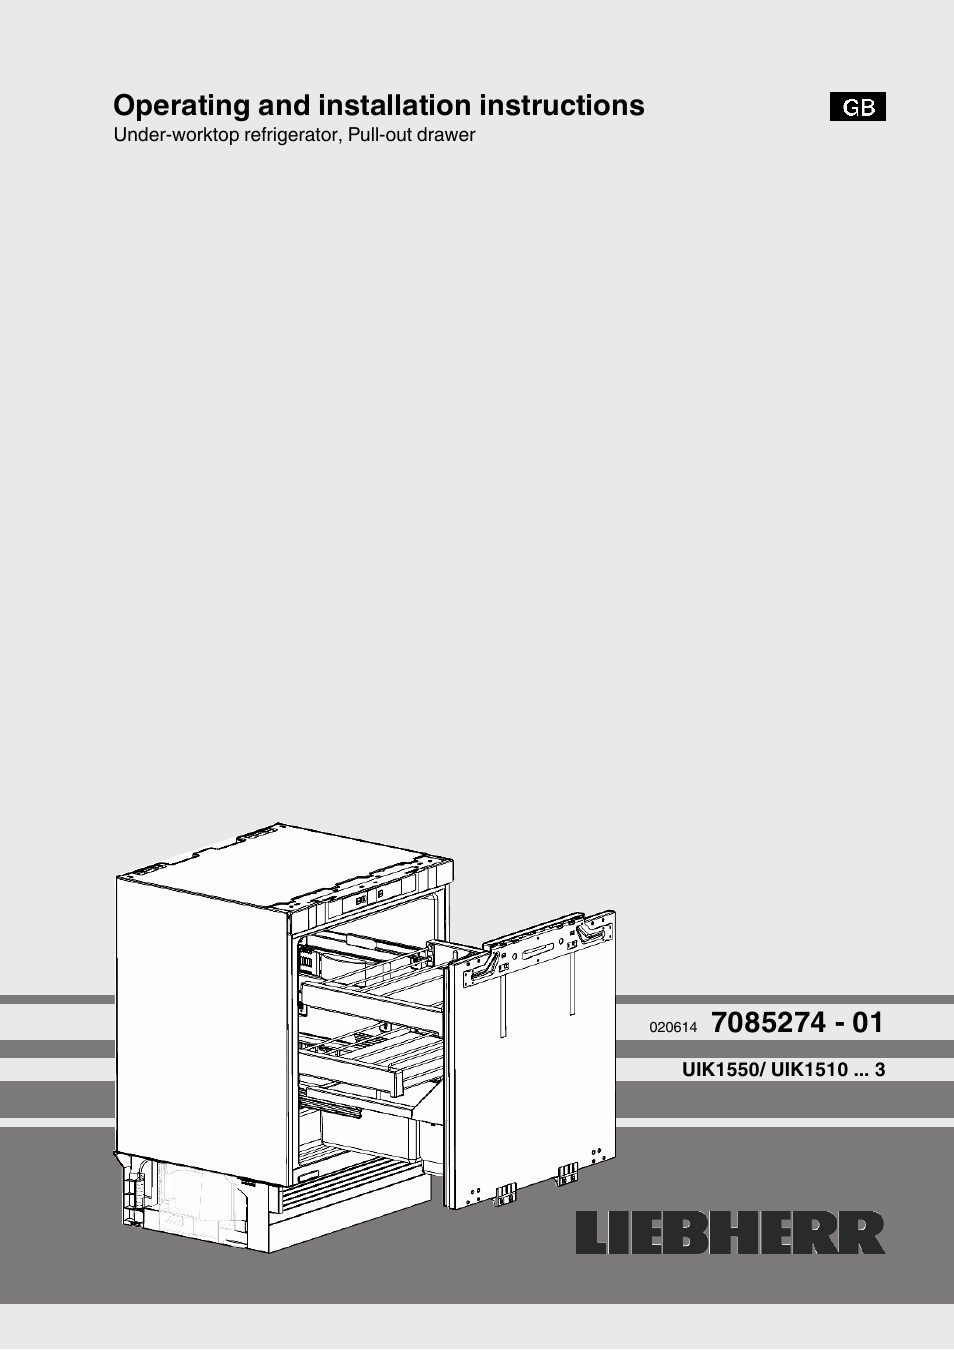 liebherr uik 1550 premium user manual 14 pages rh manualsdir com Liebherr Refrigerator Problems Liebherr Refrigerator Service